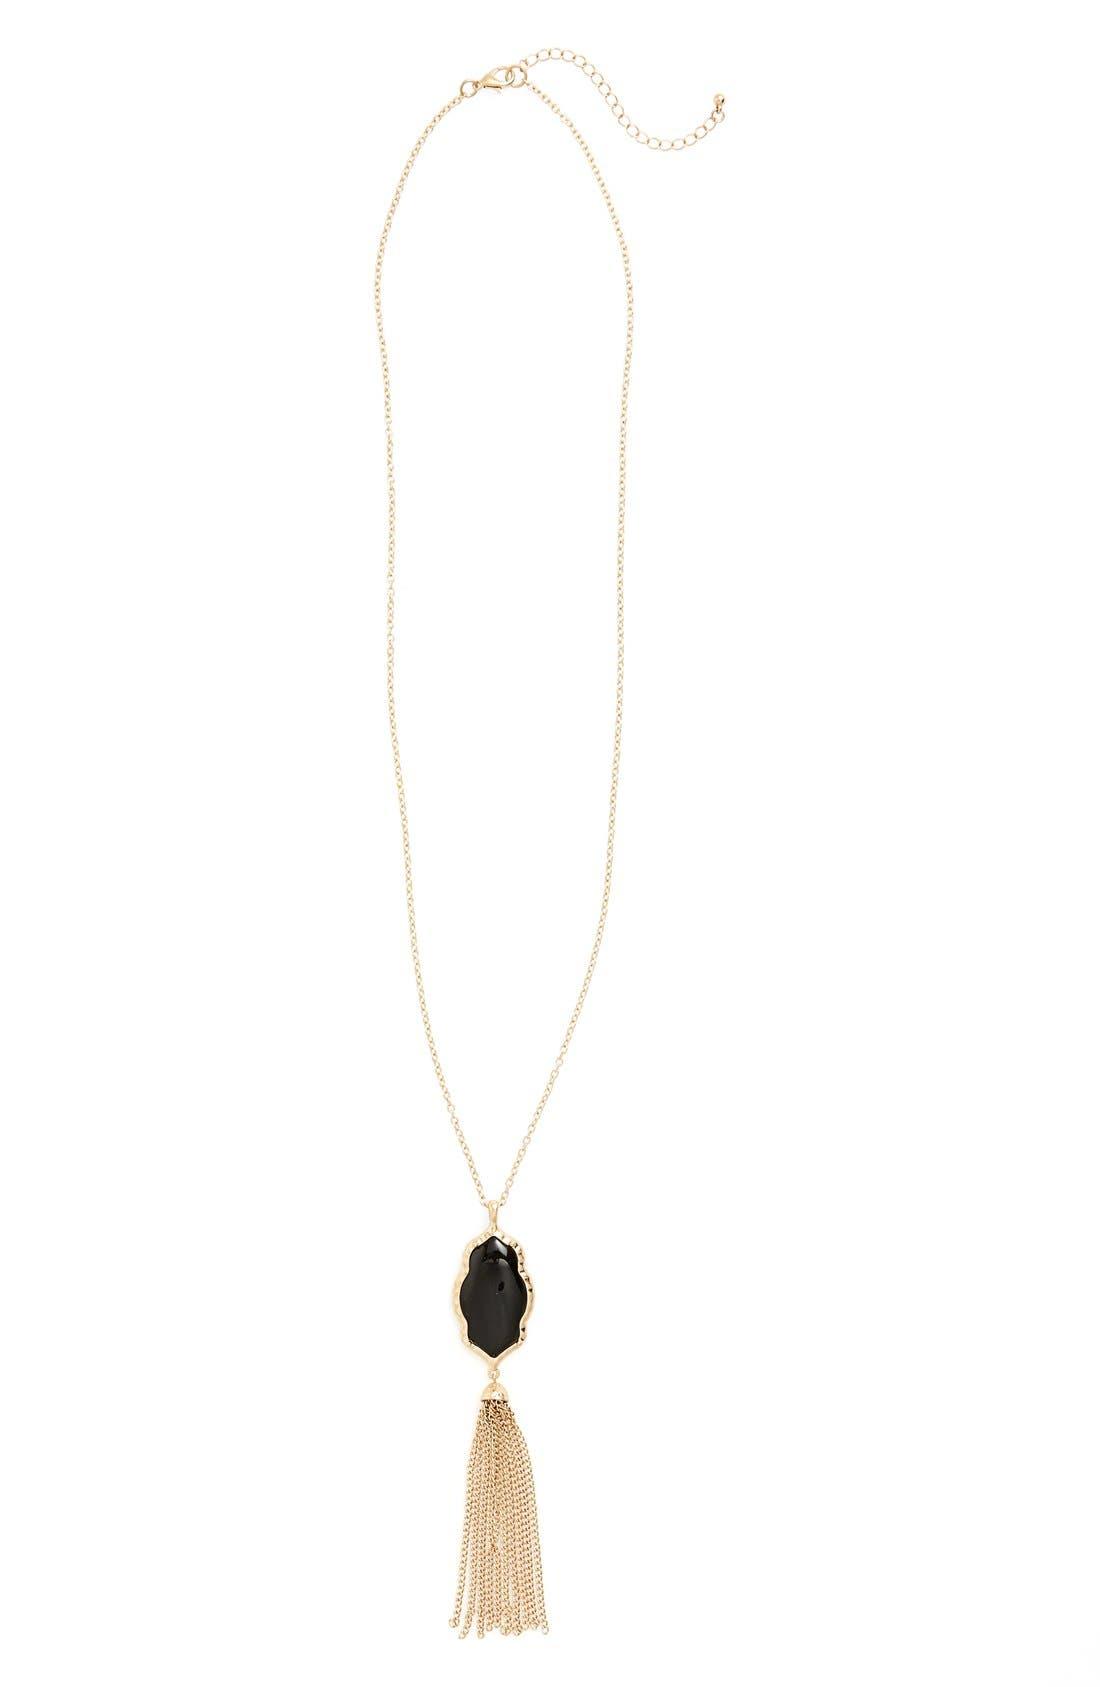 Stone Fringe Pendant Necklace,                             Main thumbnail 1, color,                             Black/ Gold